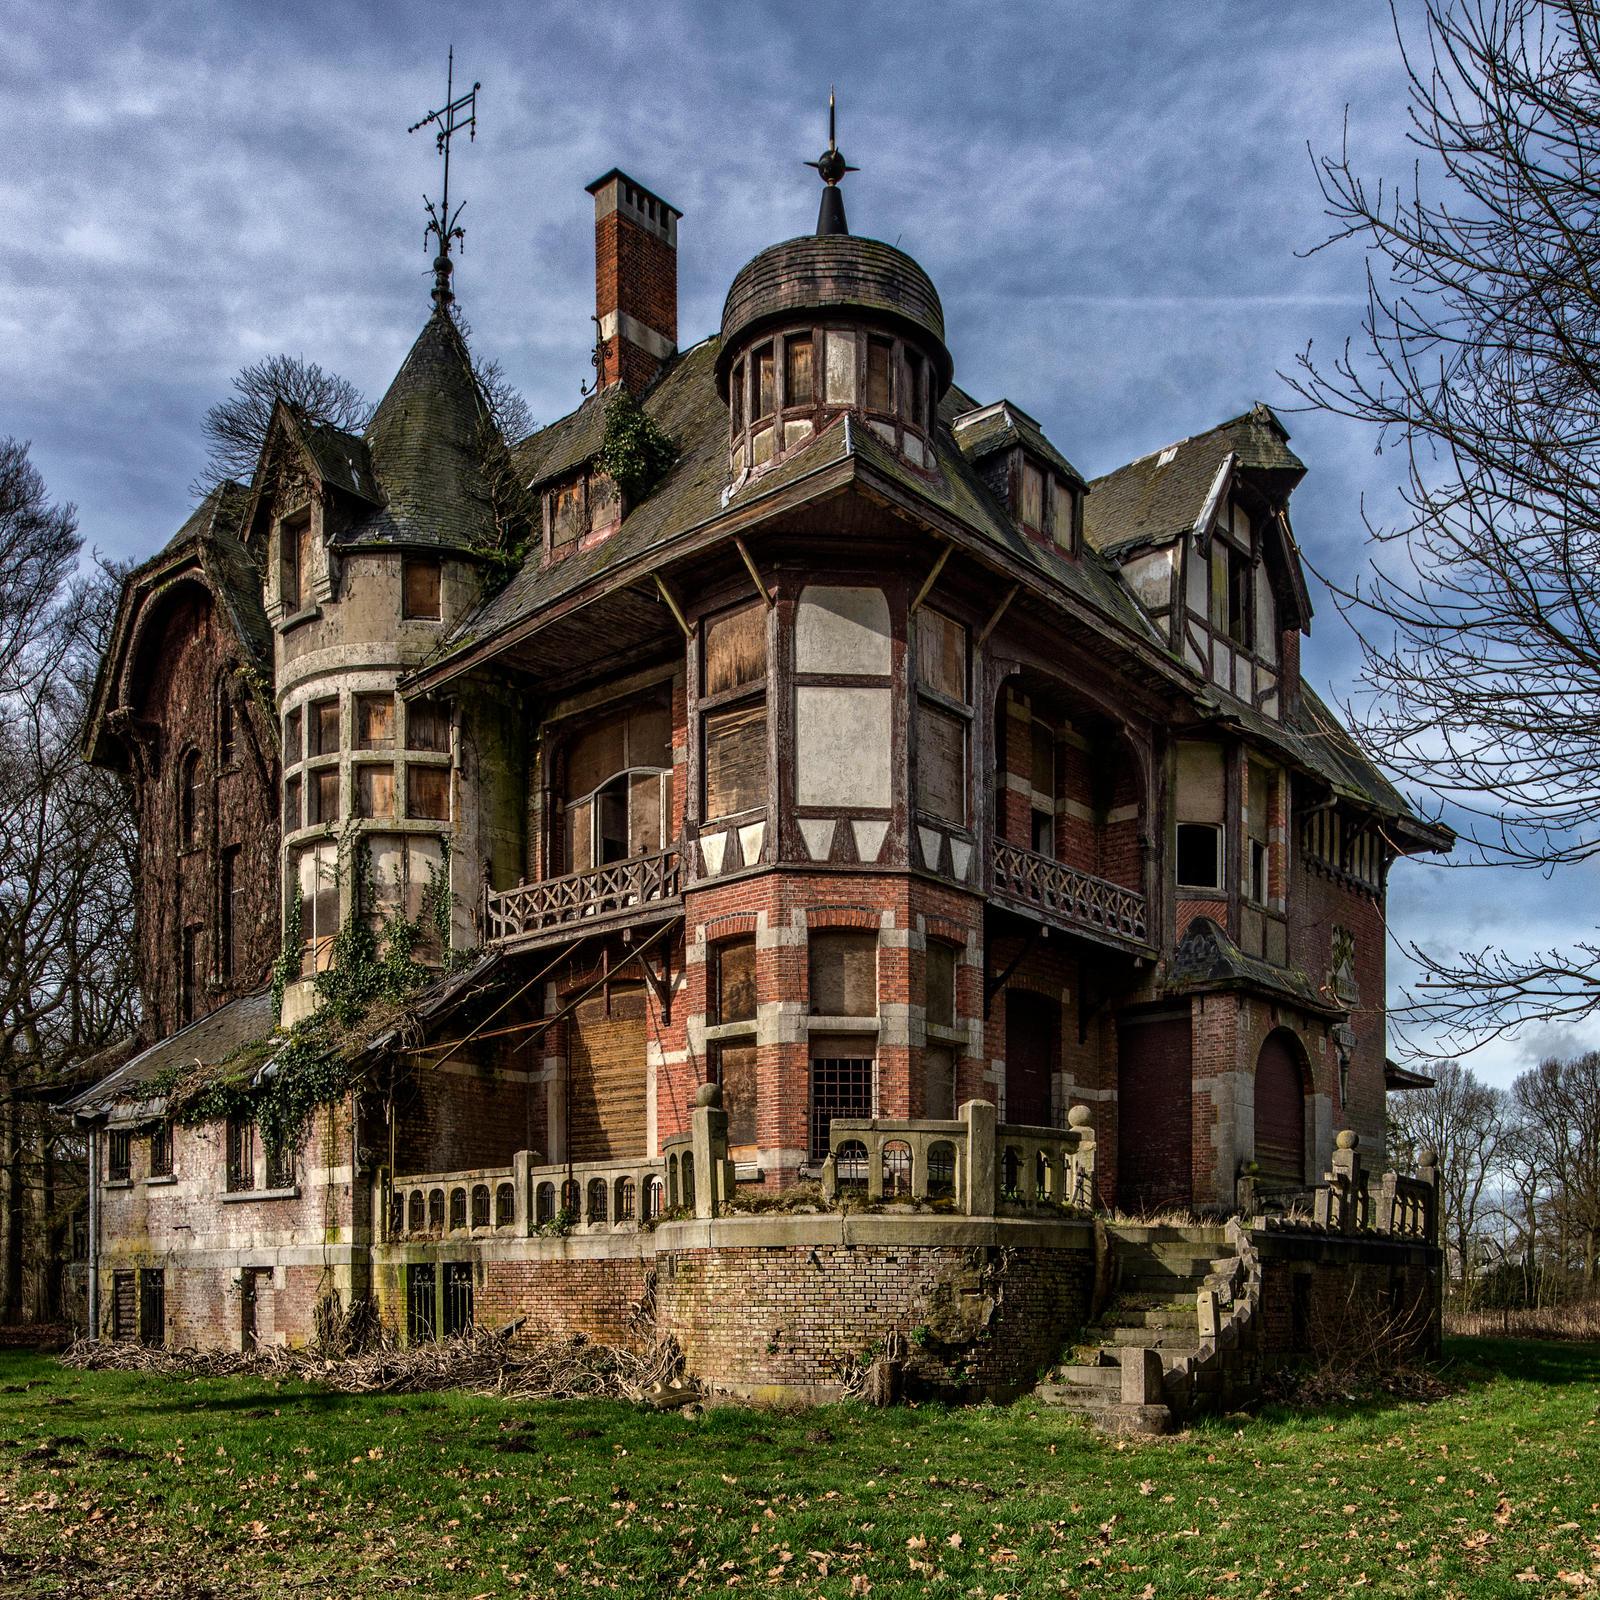 Kasteel notenboom by bramvdzphotography on deviantart for Casa home belgique